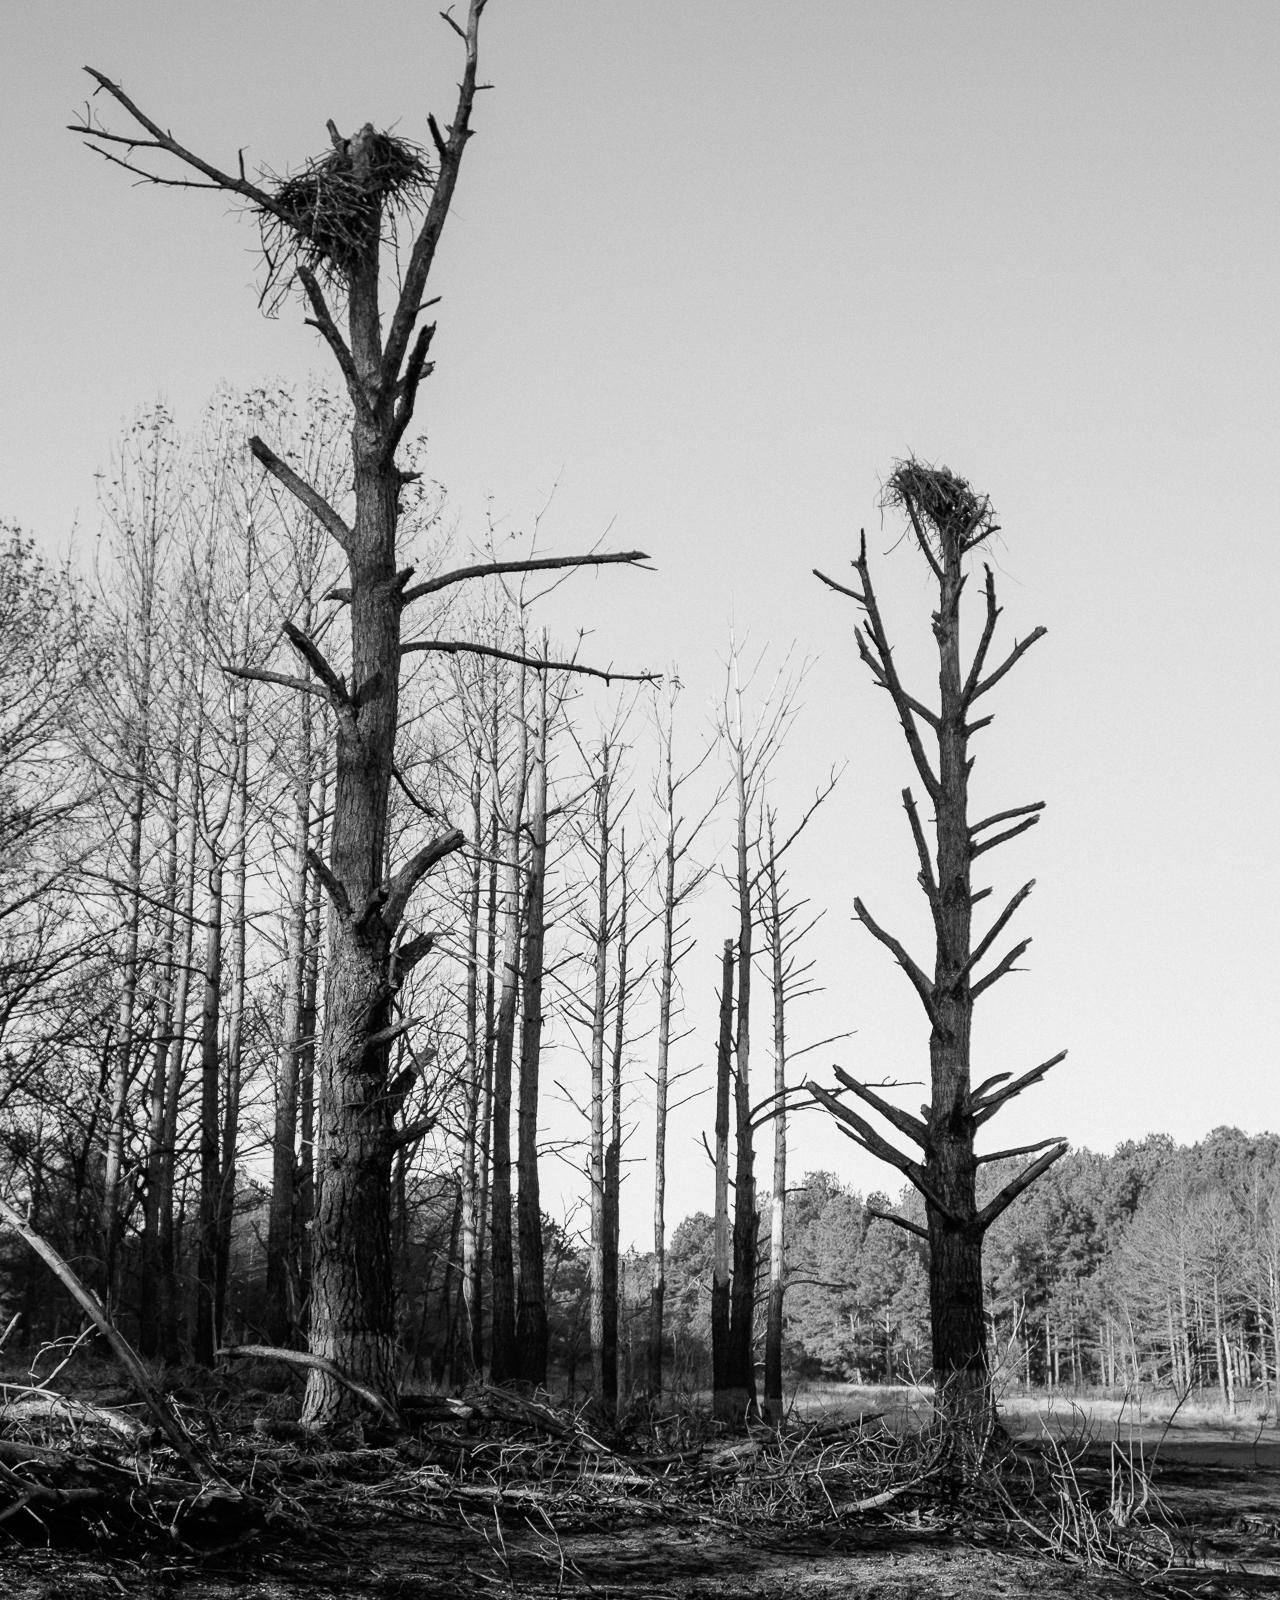 Jordan Lake, North Carolina, 2015-2.jpg